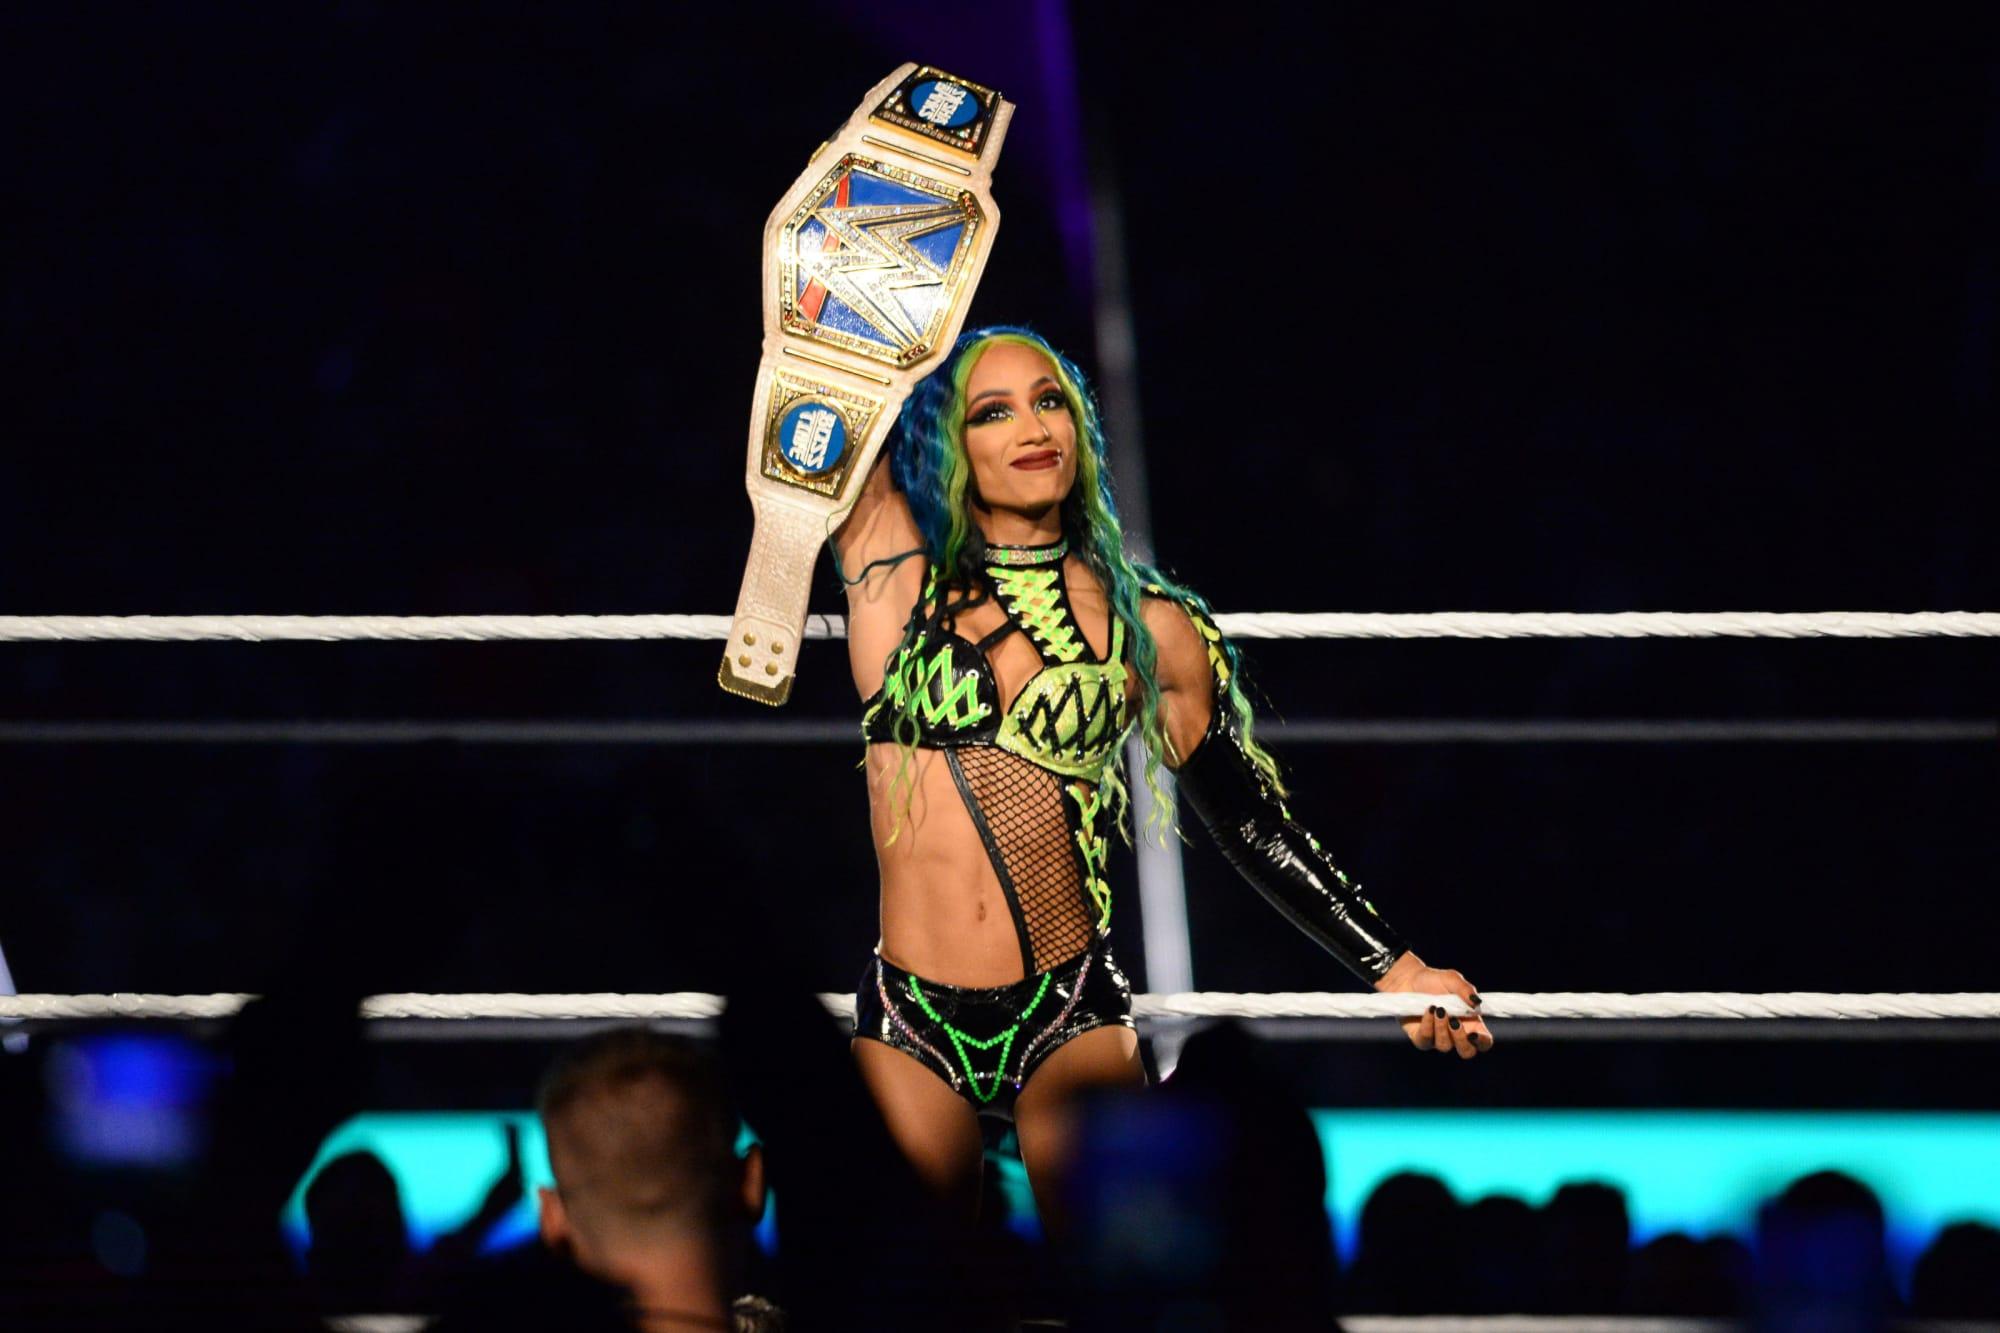 WWE SmackDown Results: Sasha Banks Returns, Cena vs. Reigns Official